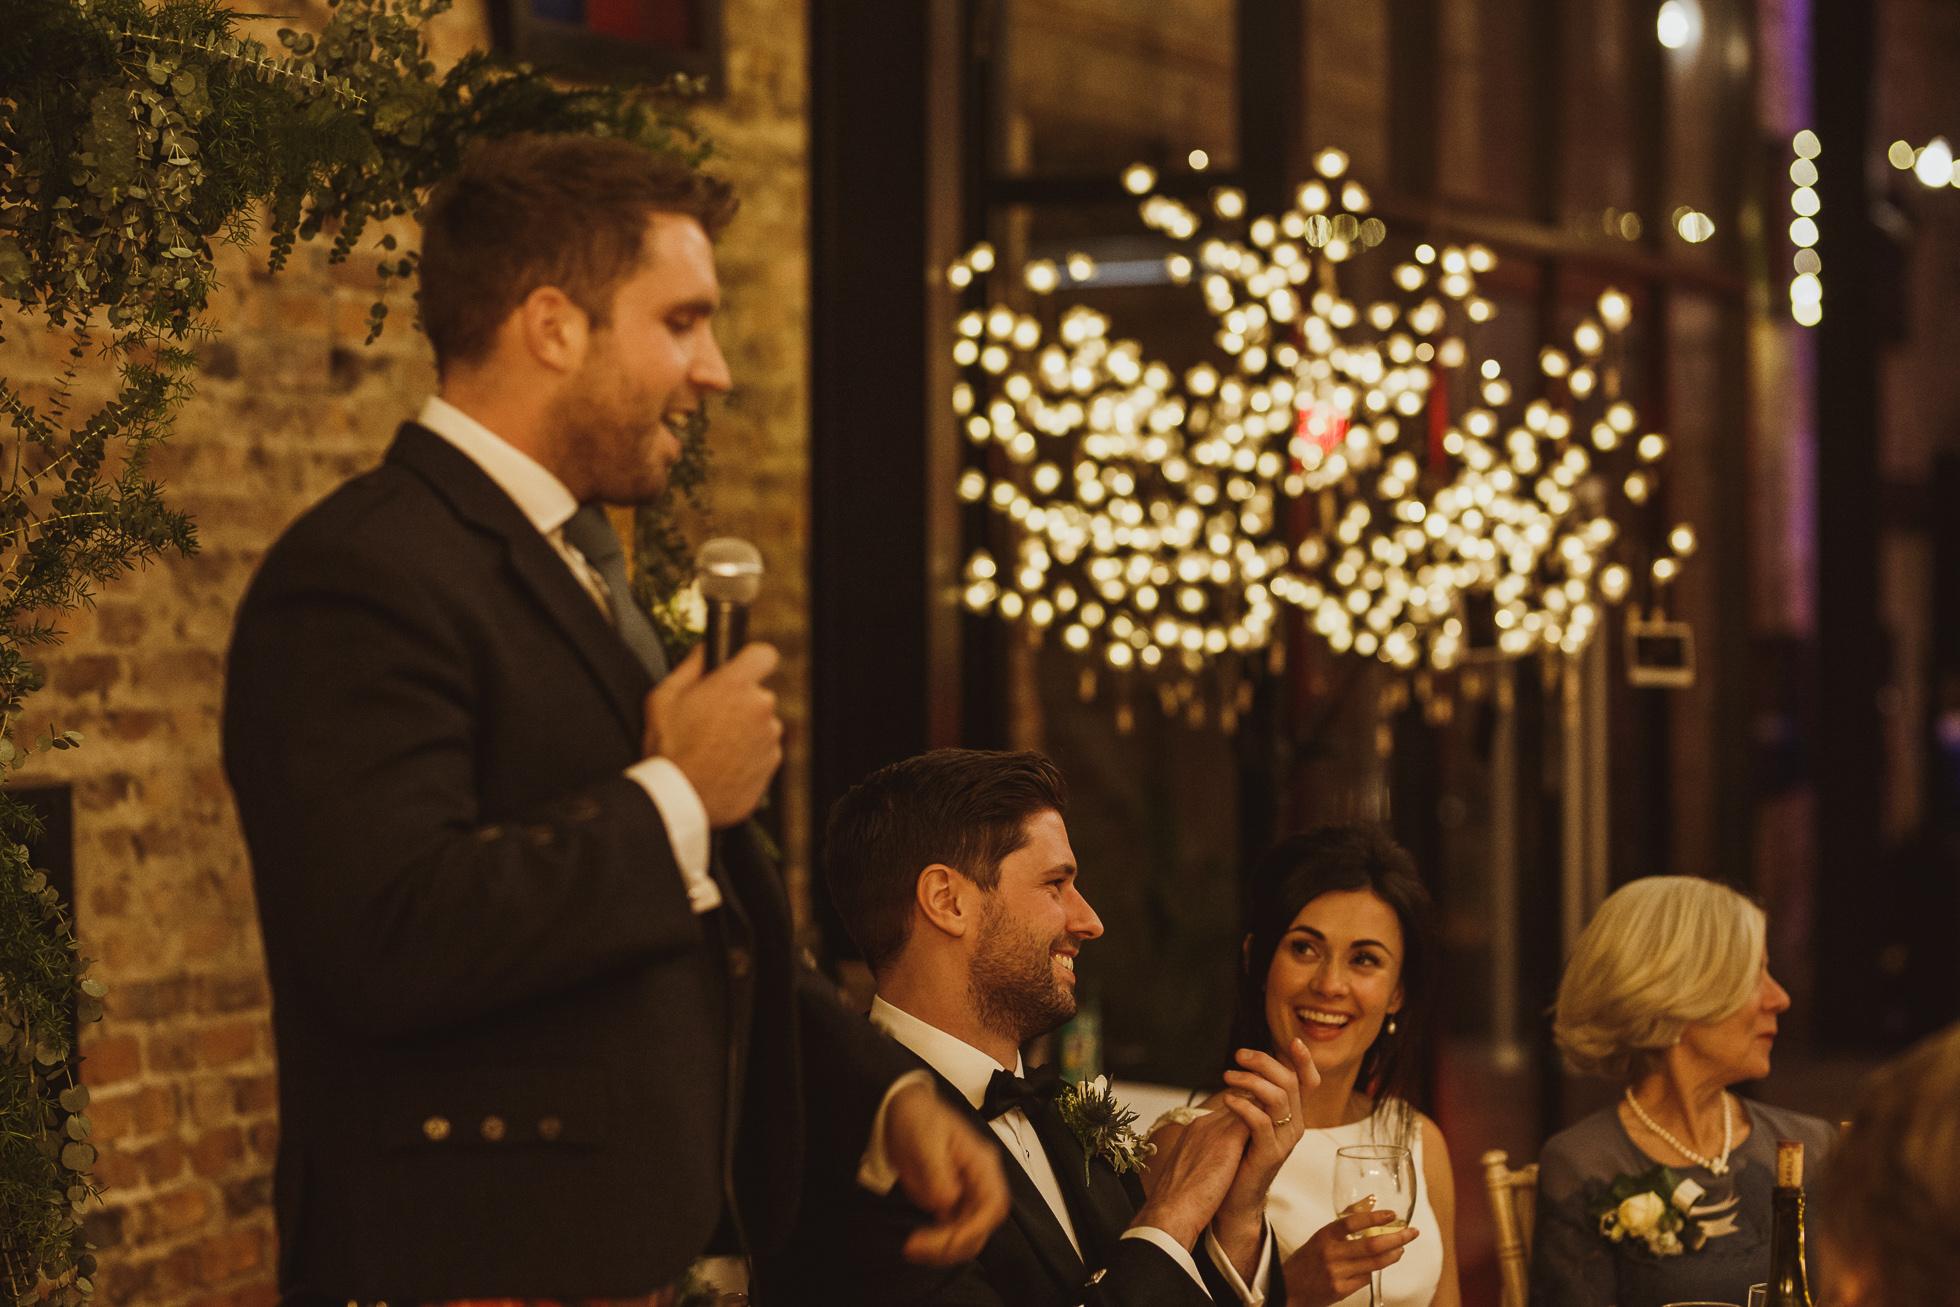 hornington_manor_wedding_photographer-107.jpg